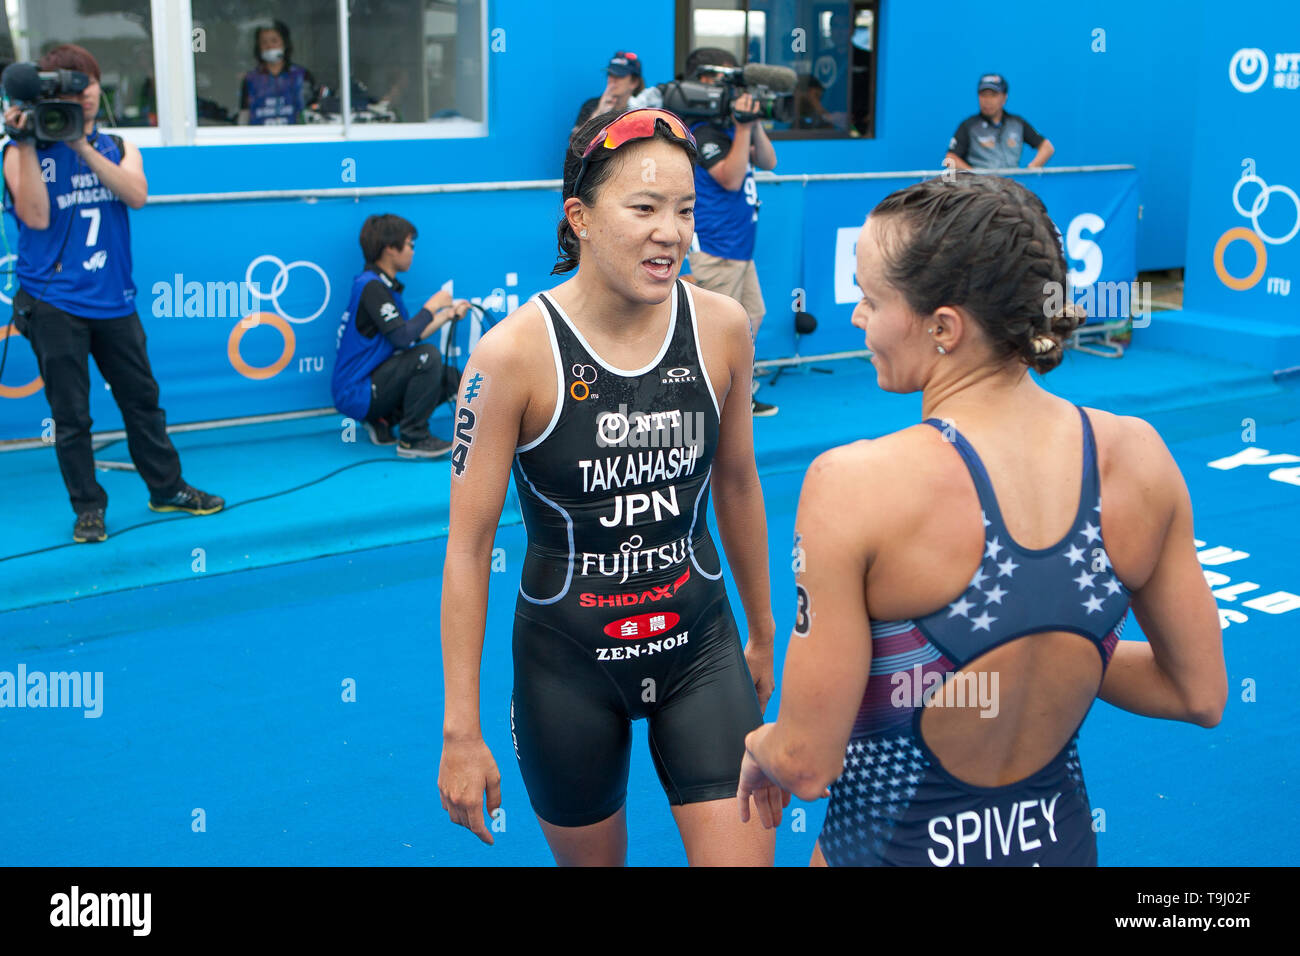 Yokohama, Japan. 18th May, 2019. 2019 ITU World Triathlon, World Paratriathlon Yokohama at Yamashita Park and Minato Mirai, Yokohama. Takahashi, Spivey (Photos by Michael Steinebach/AFLO) Credit: Aflo Co. Ltd./Alamy Live News Stock Photo